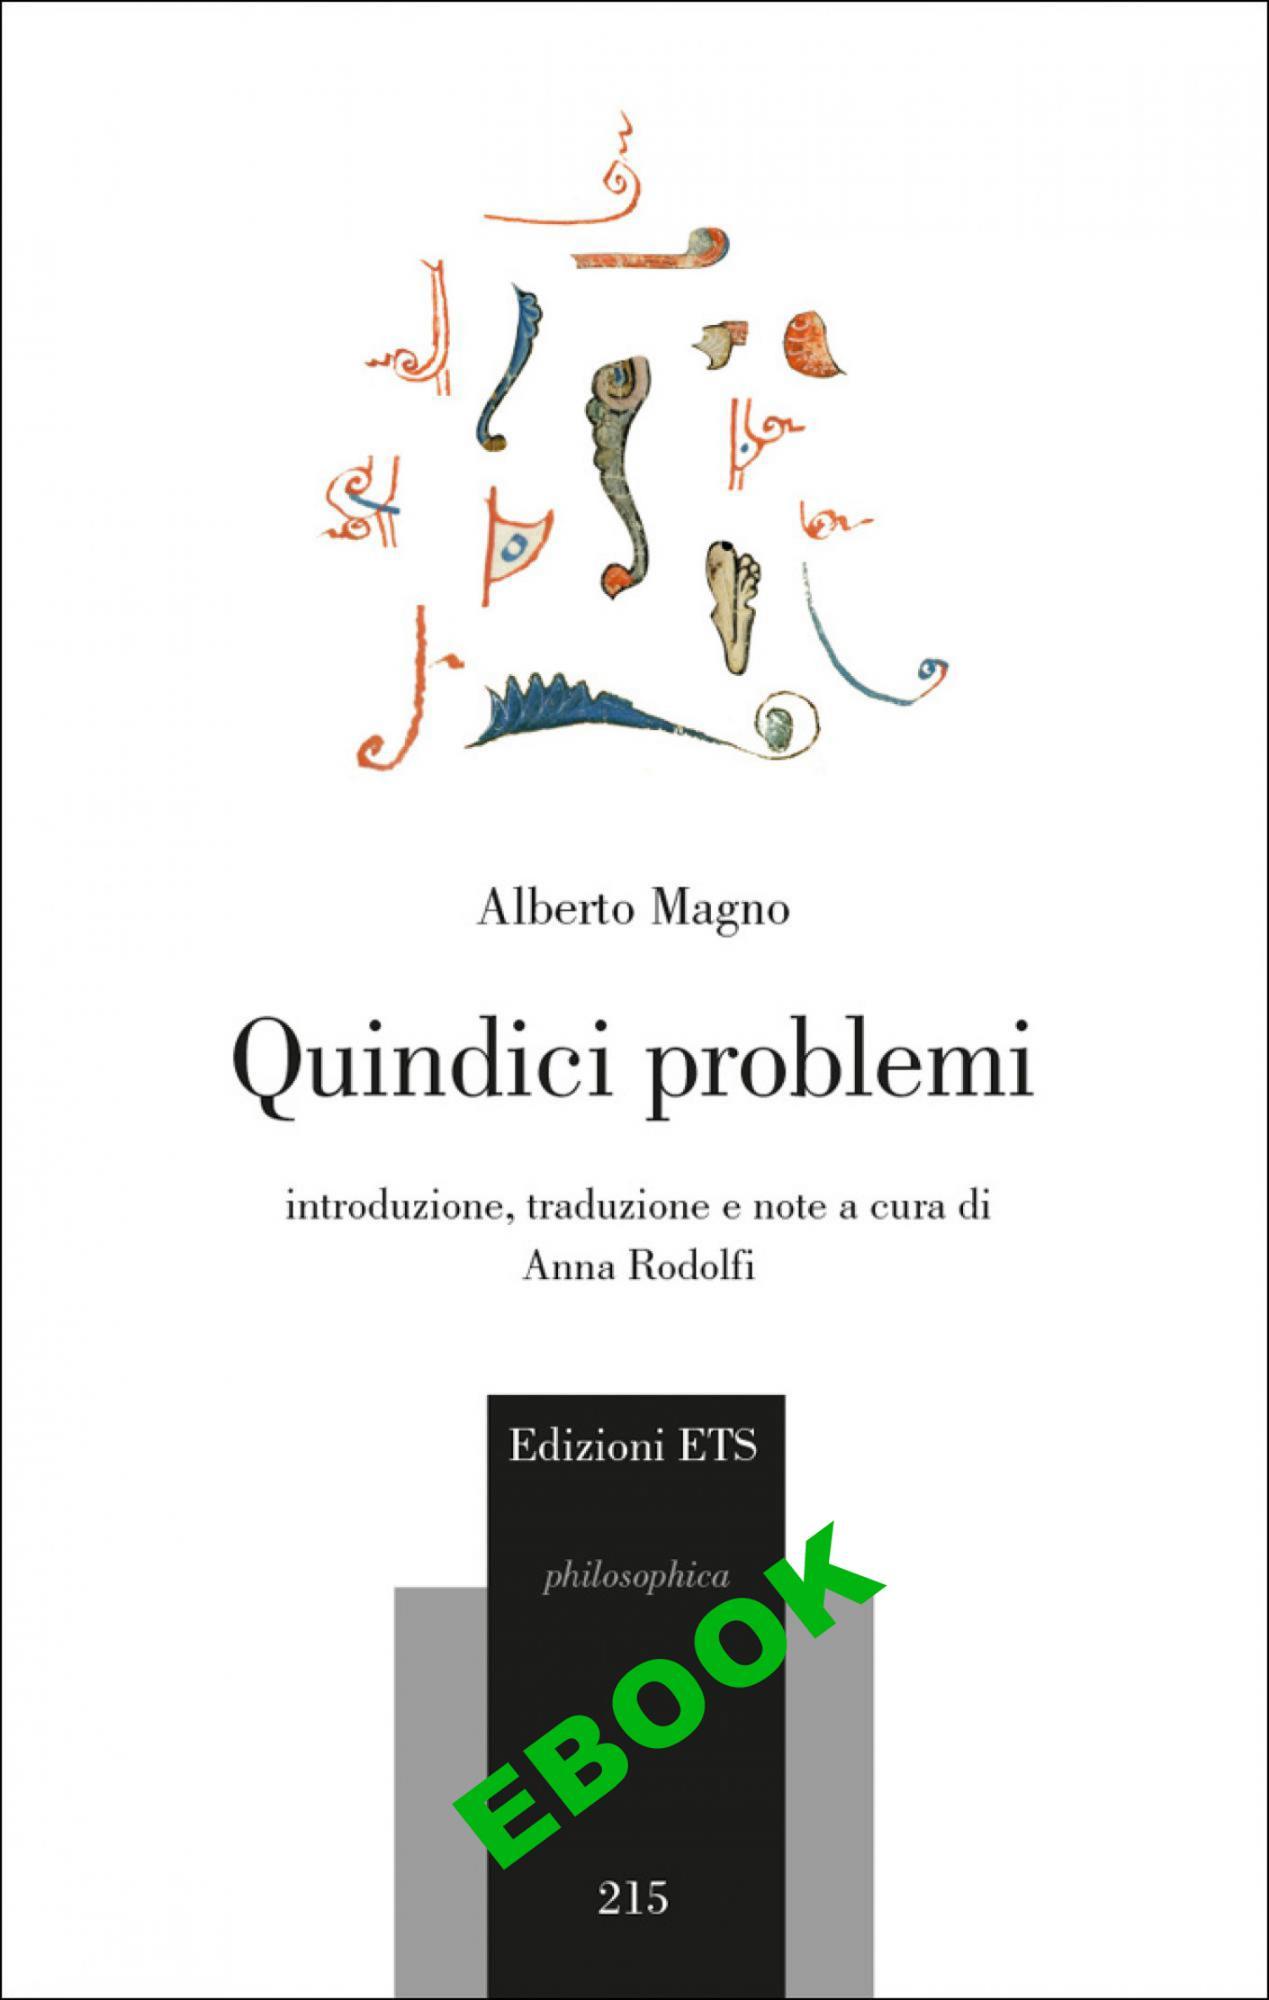 Quindici problemi